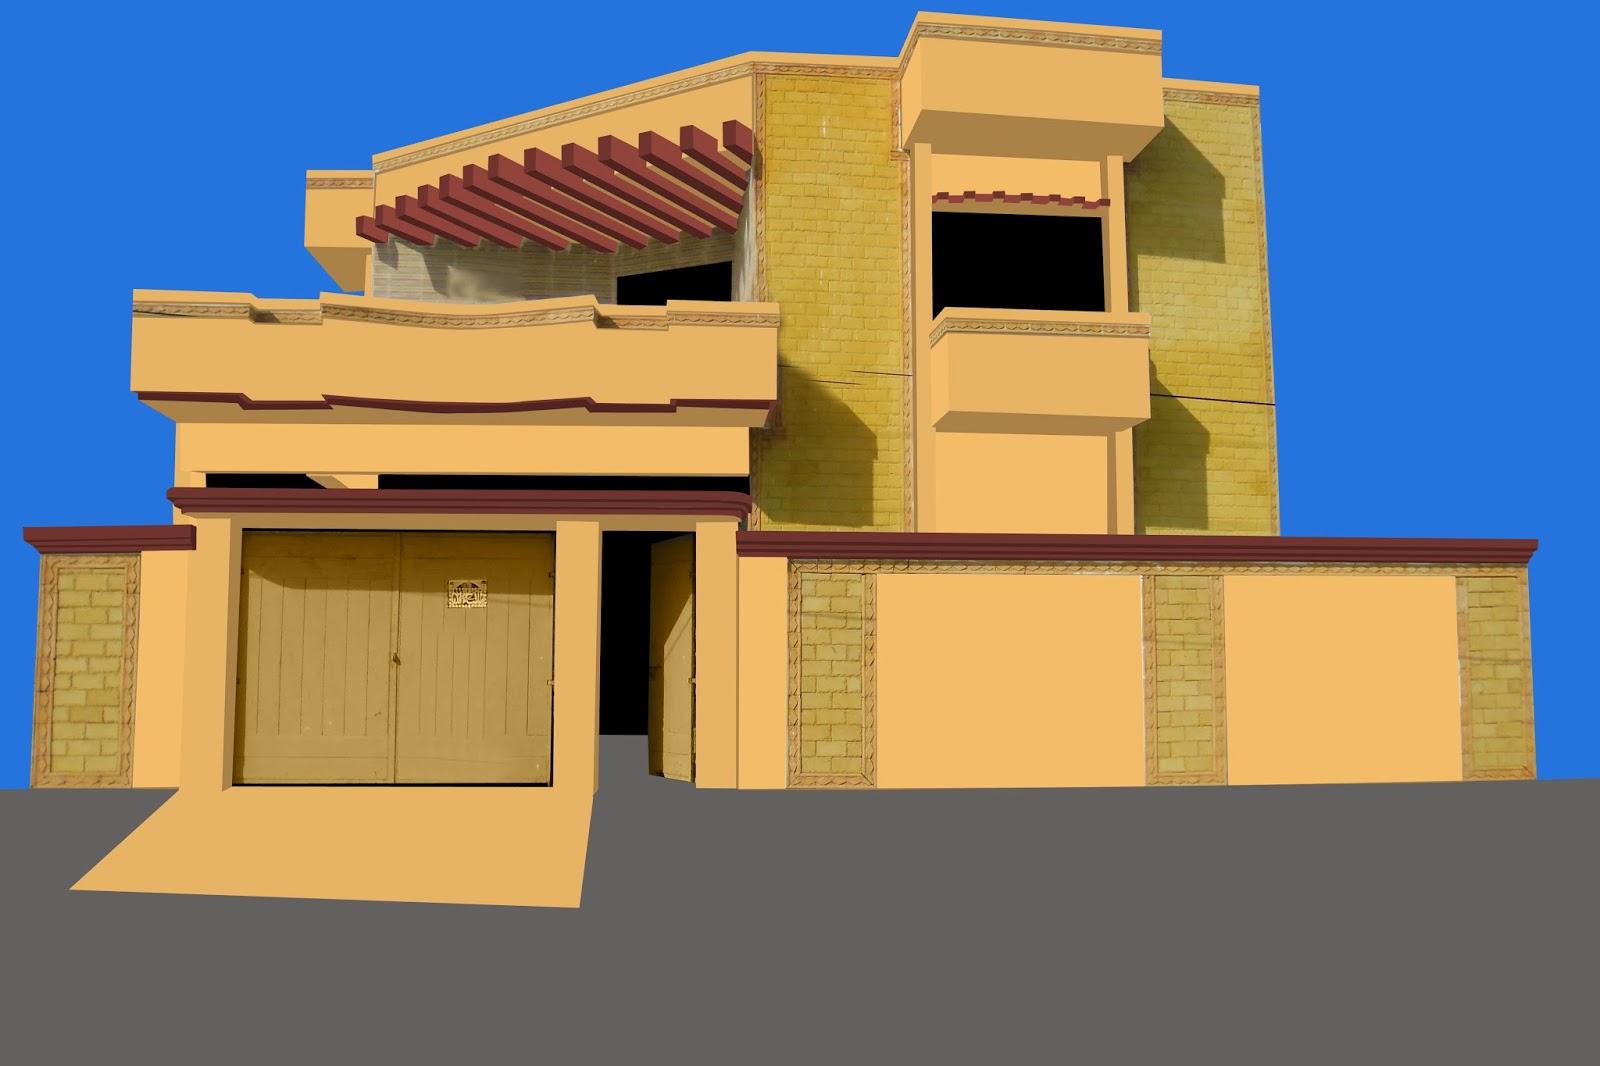 Colours For Front Elevation : Paints of ideas pakistan front elevation the color image